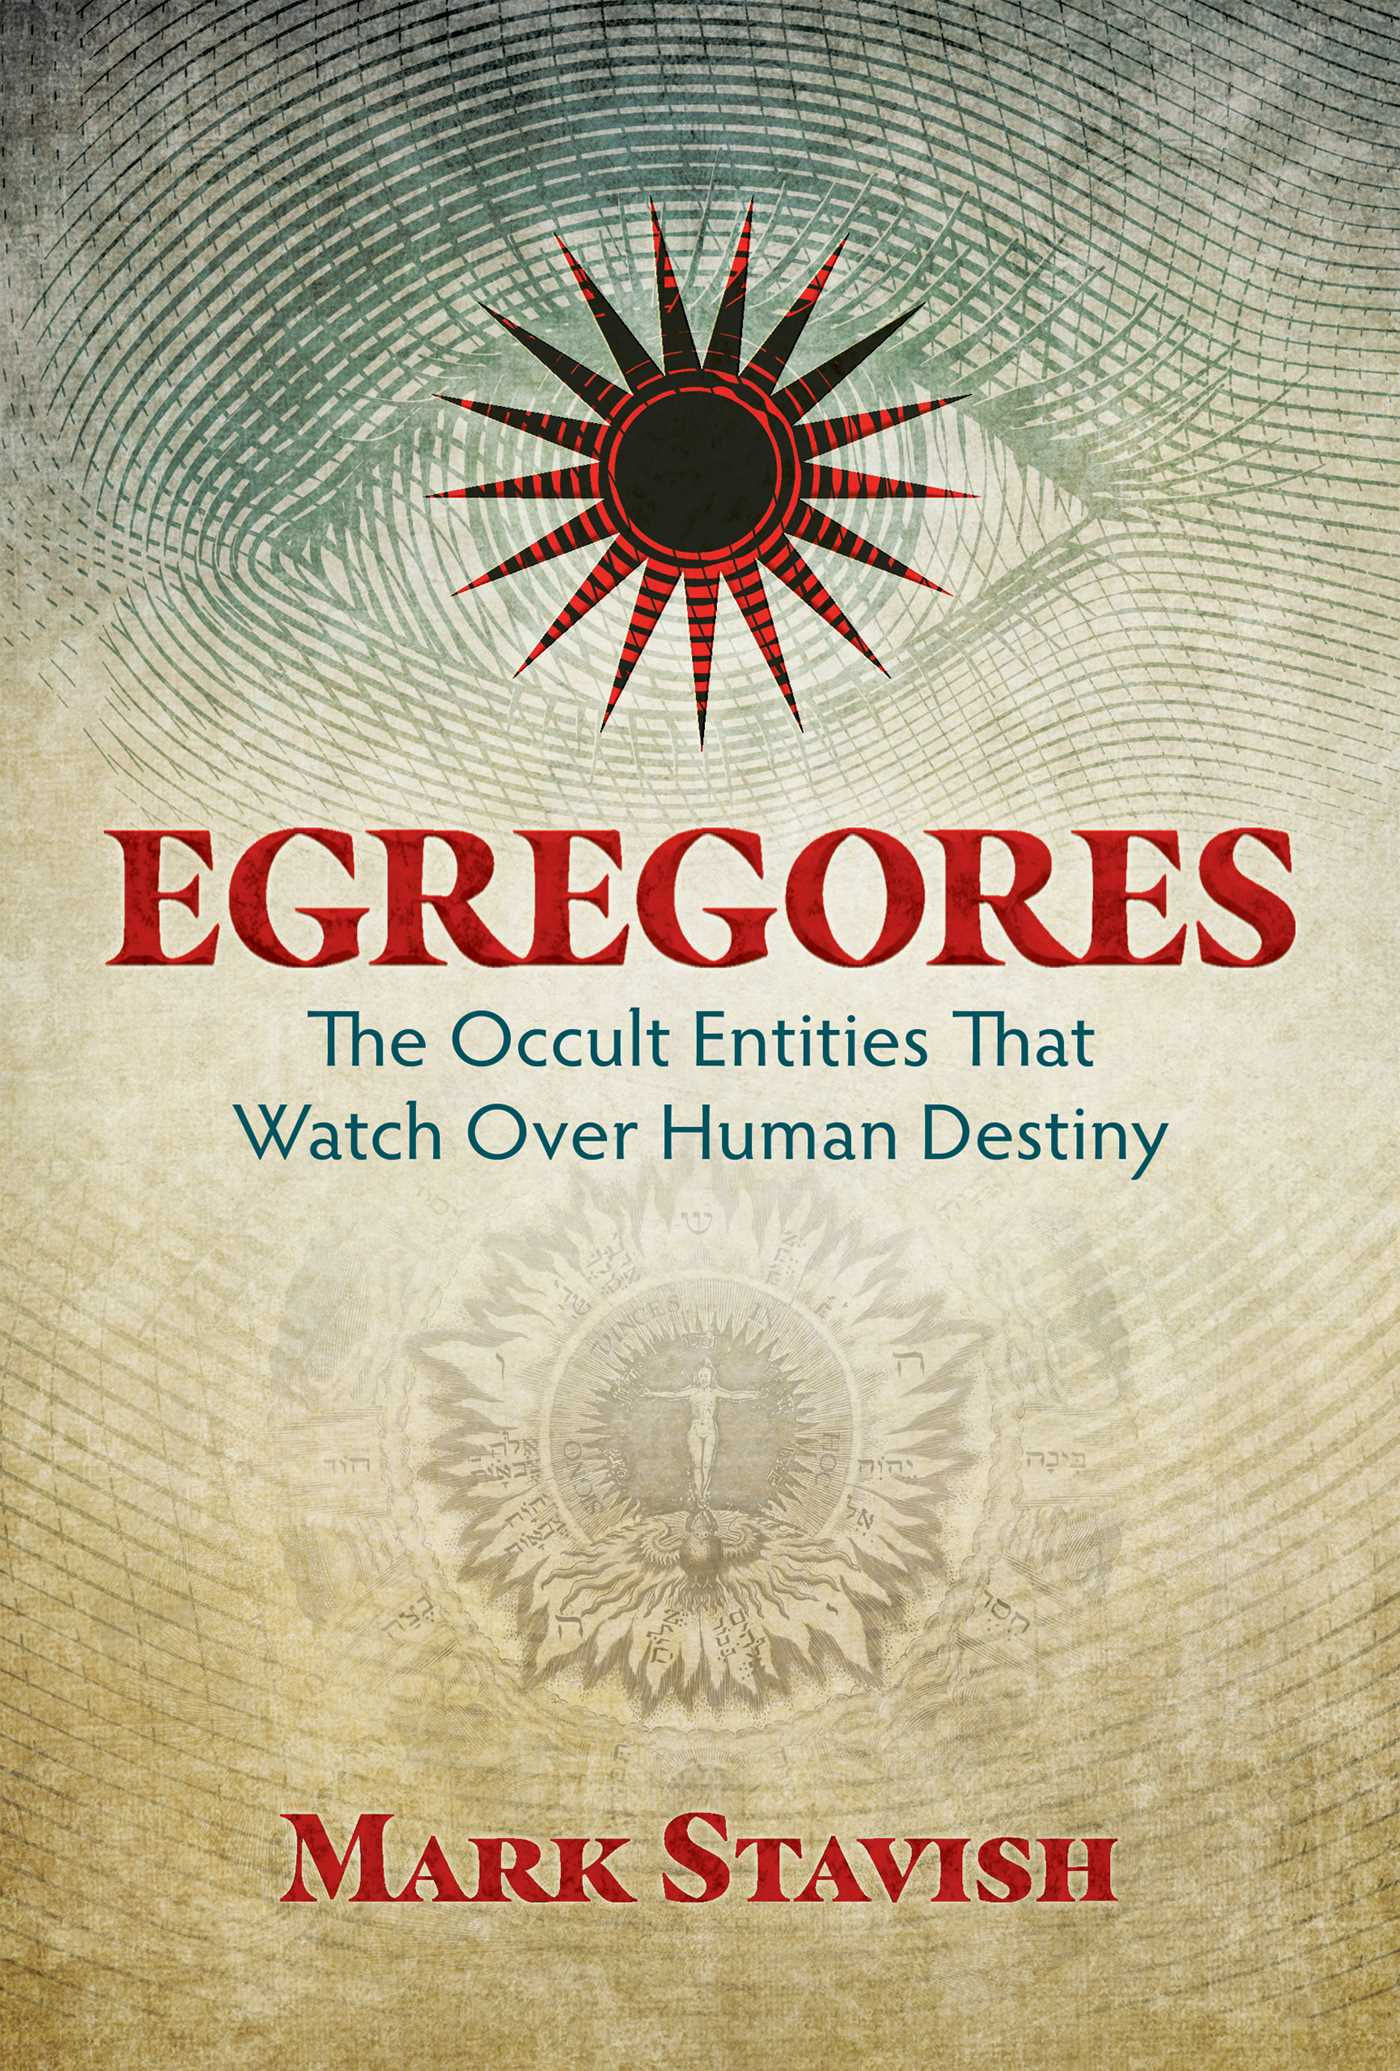 Egregores 9781620555781 hr